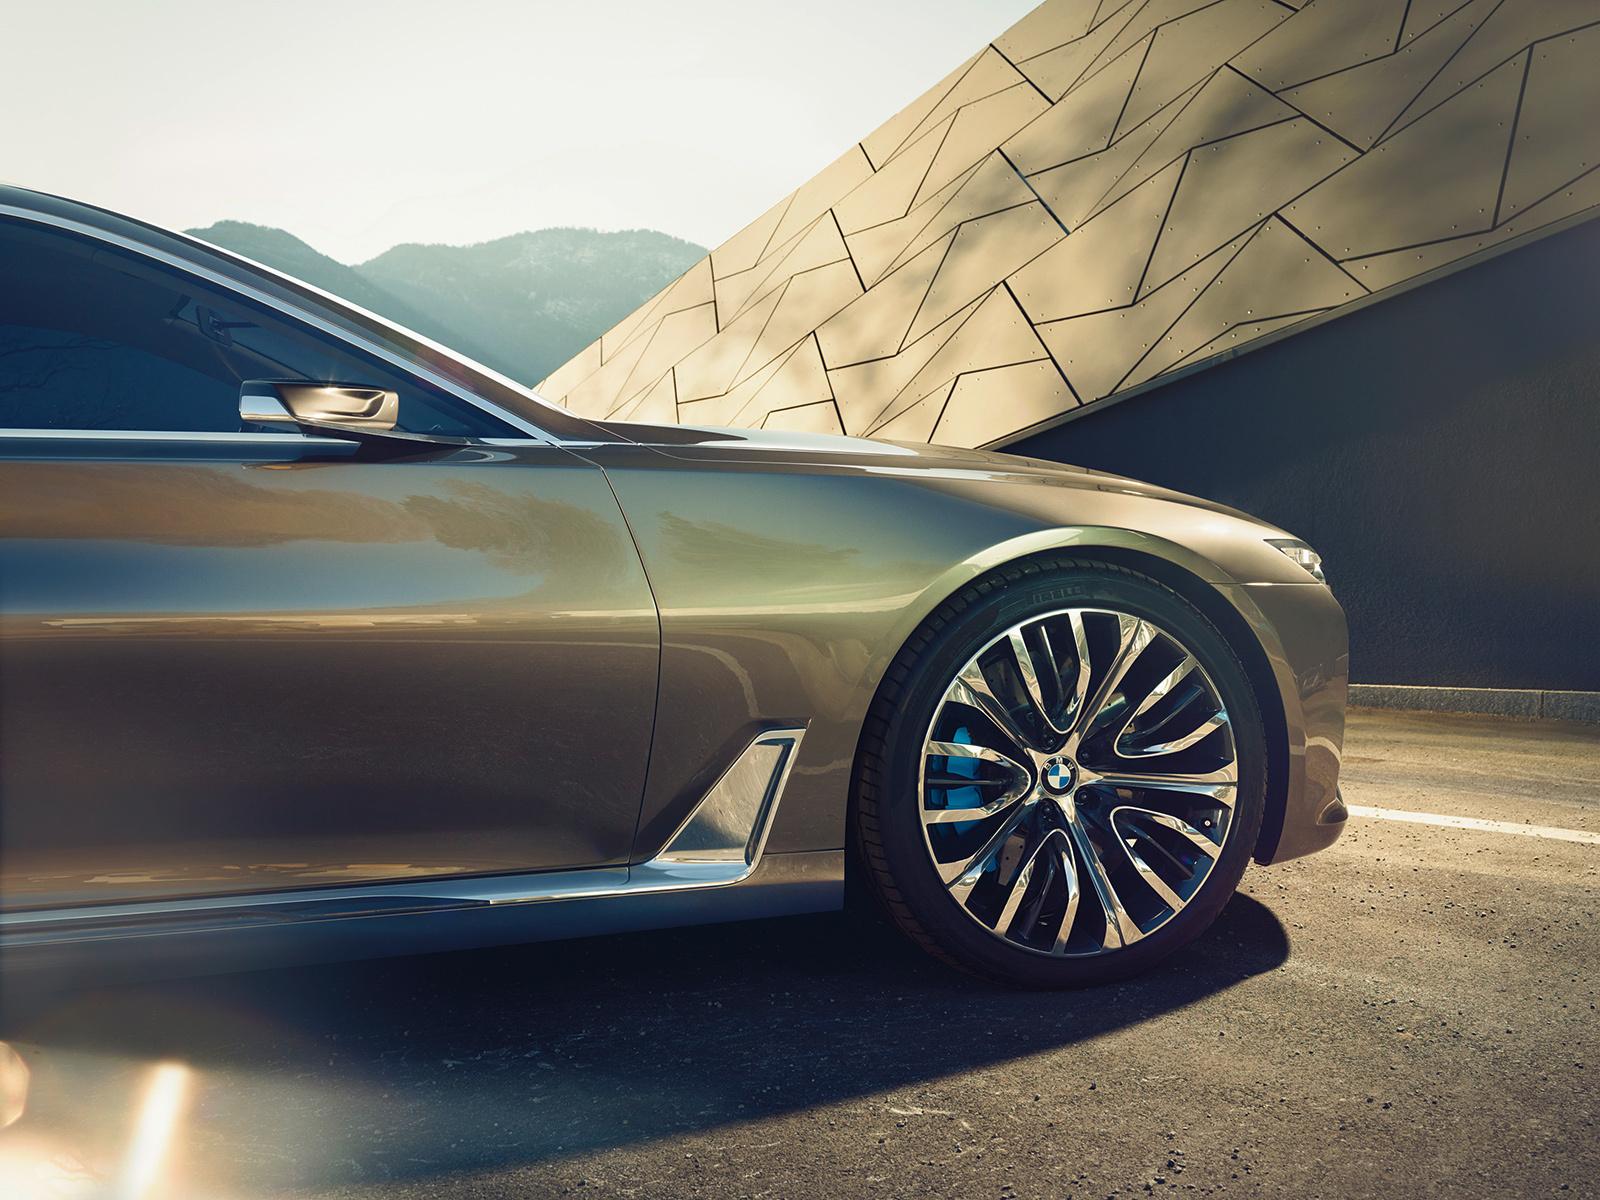 BMW Vision Future Luxury Background